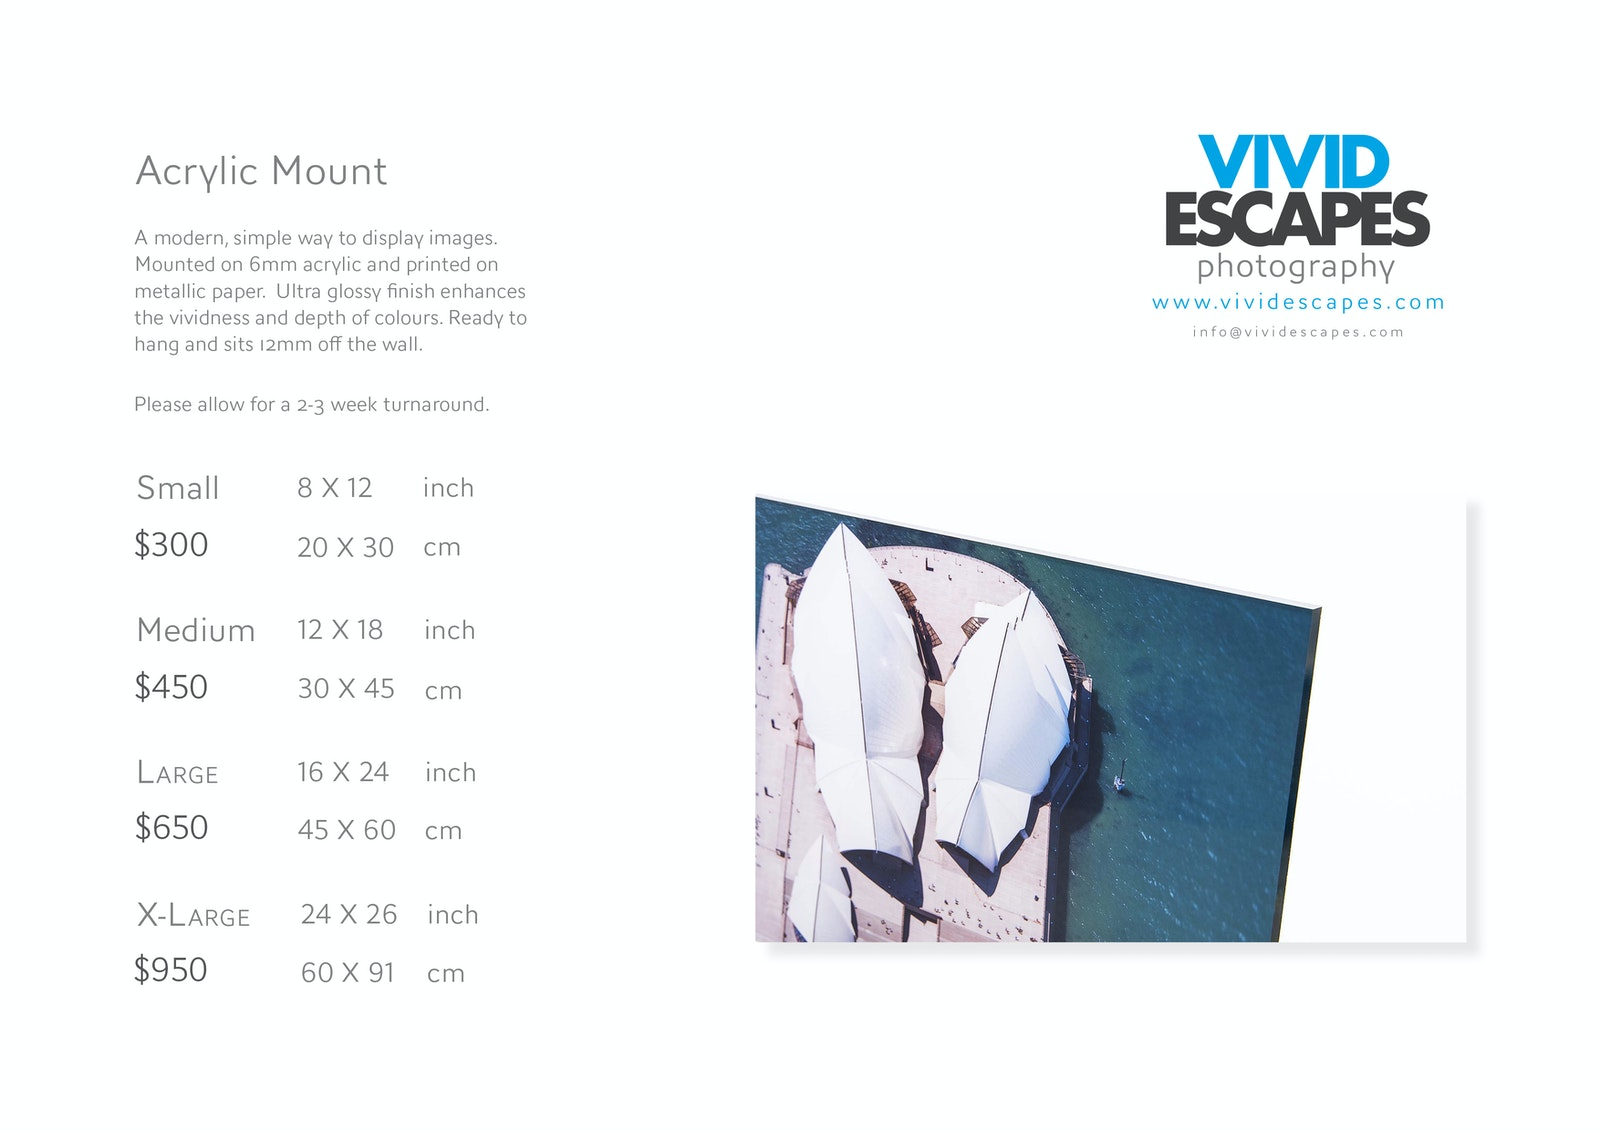 Vivid_Escapes_Price_List_NEW5